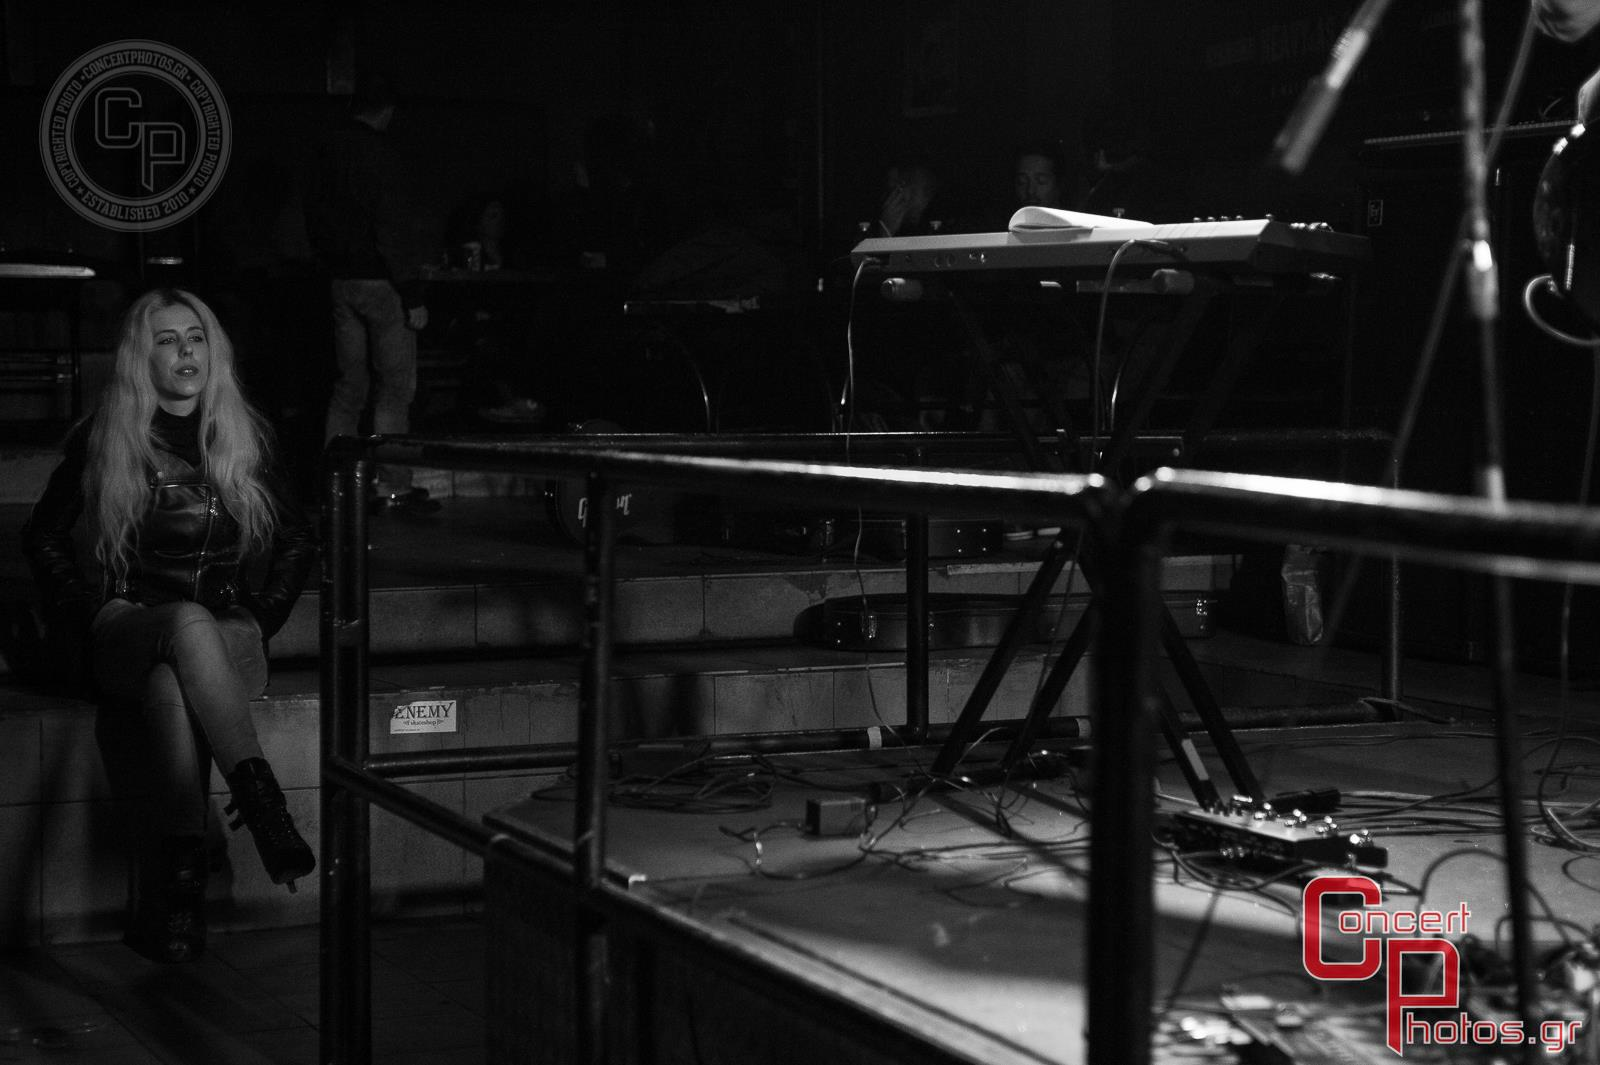 Battle Of The Bands Leg 1-Battle Of The Bands Leg 1 photographer:  - ConcertPhotos - 20141126_2327_25